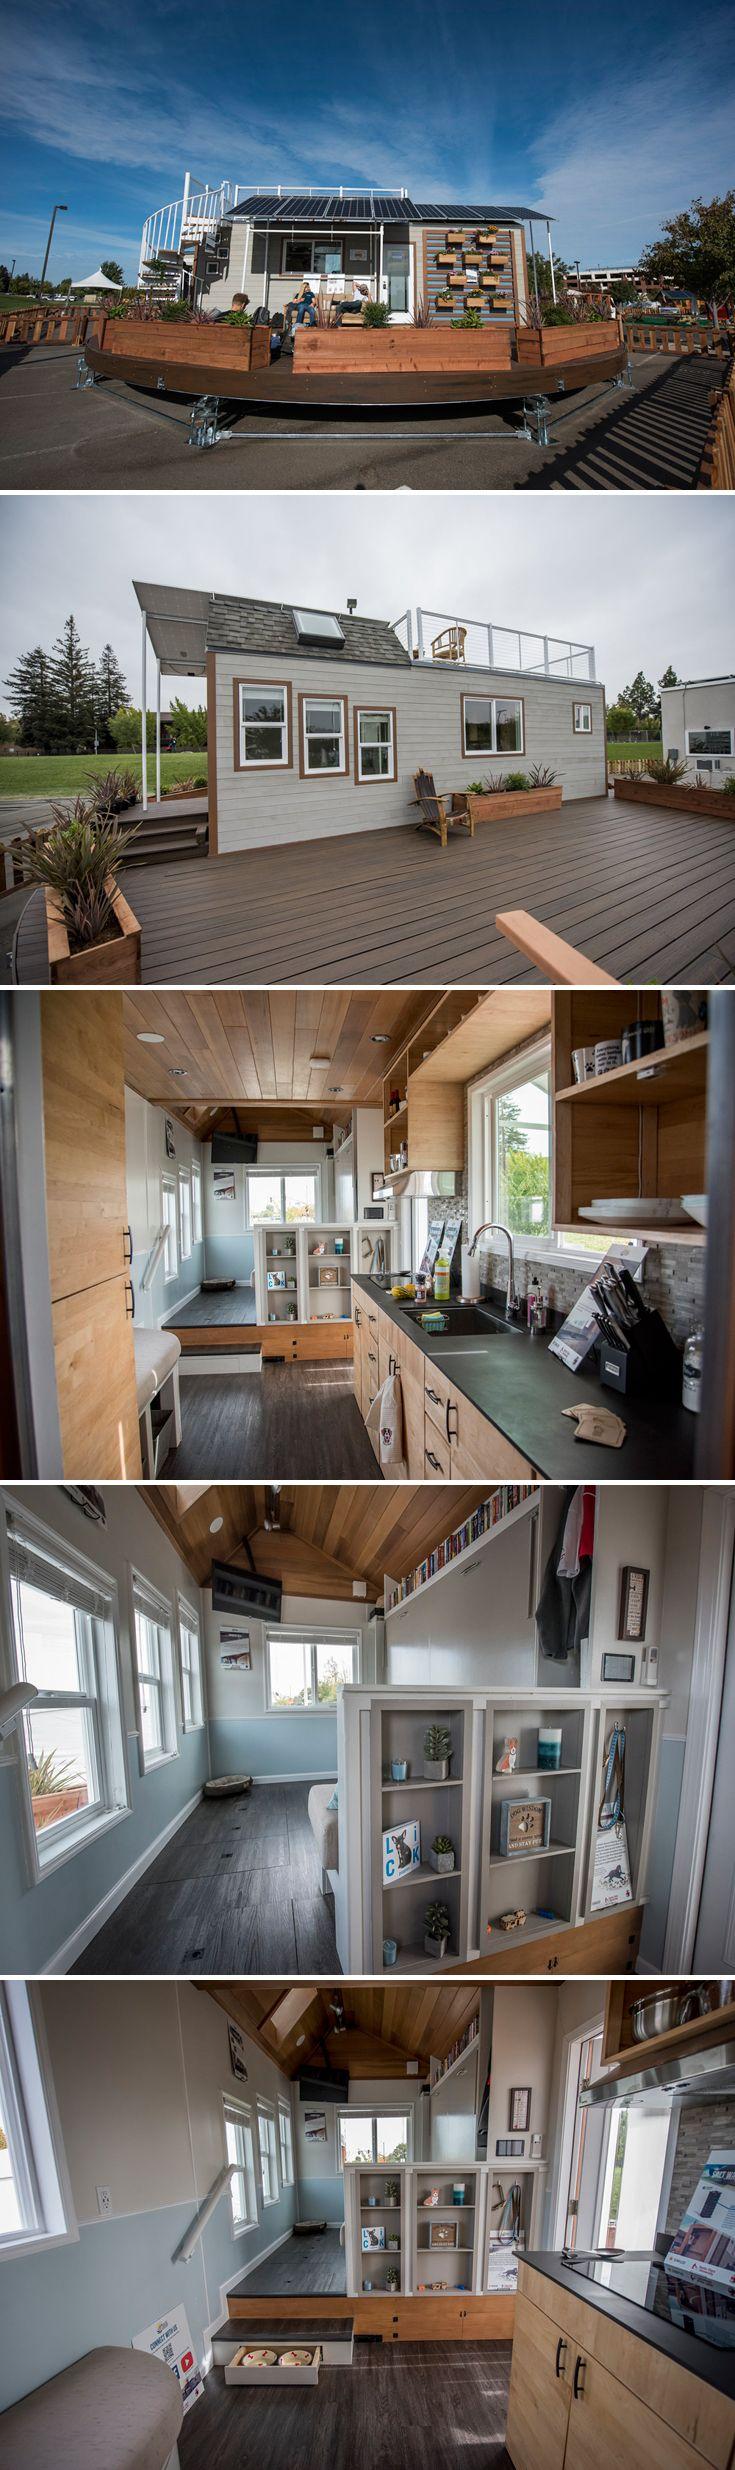 A 238 sqft off grid tiny house powered